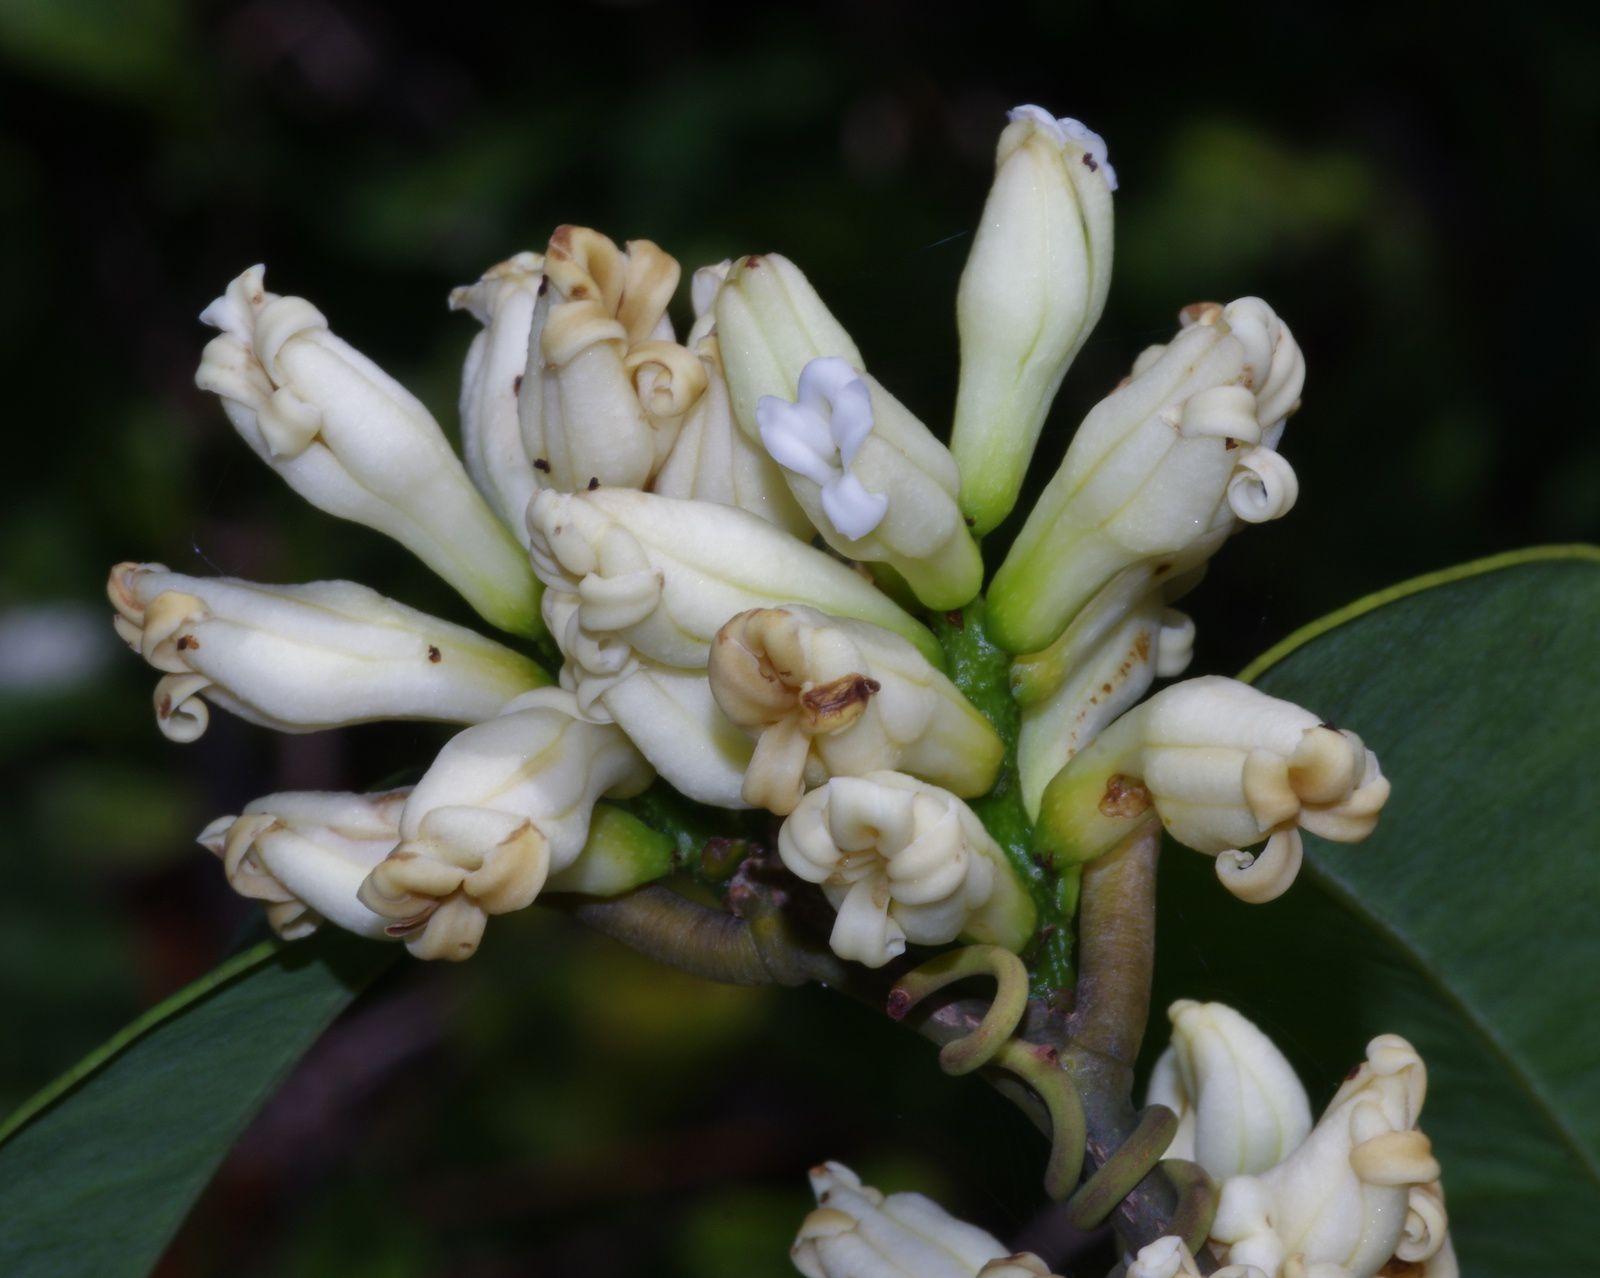 Moutabea guianensis (moutabié de la Guyane, graines macaque)